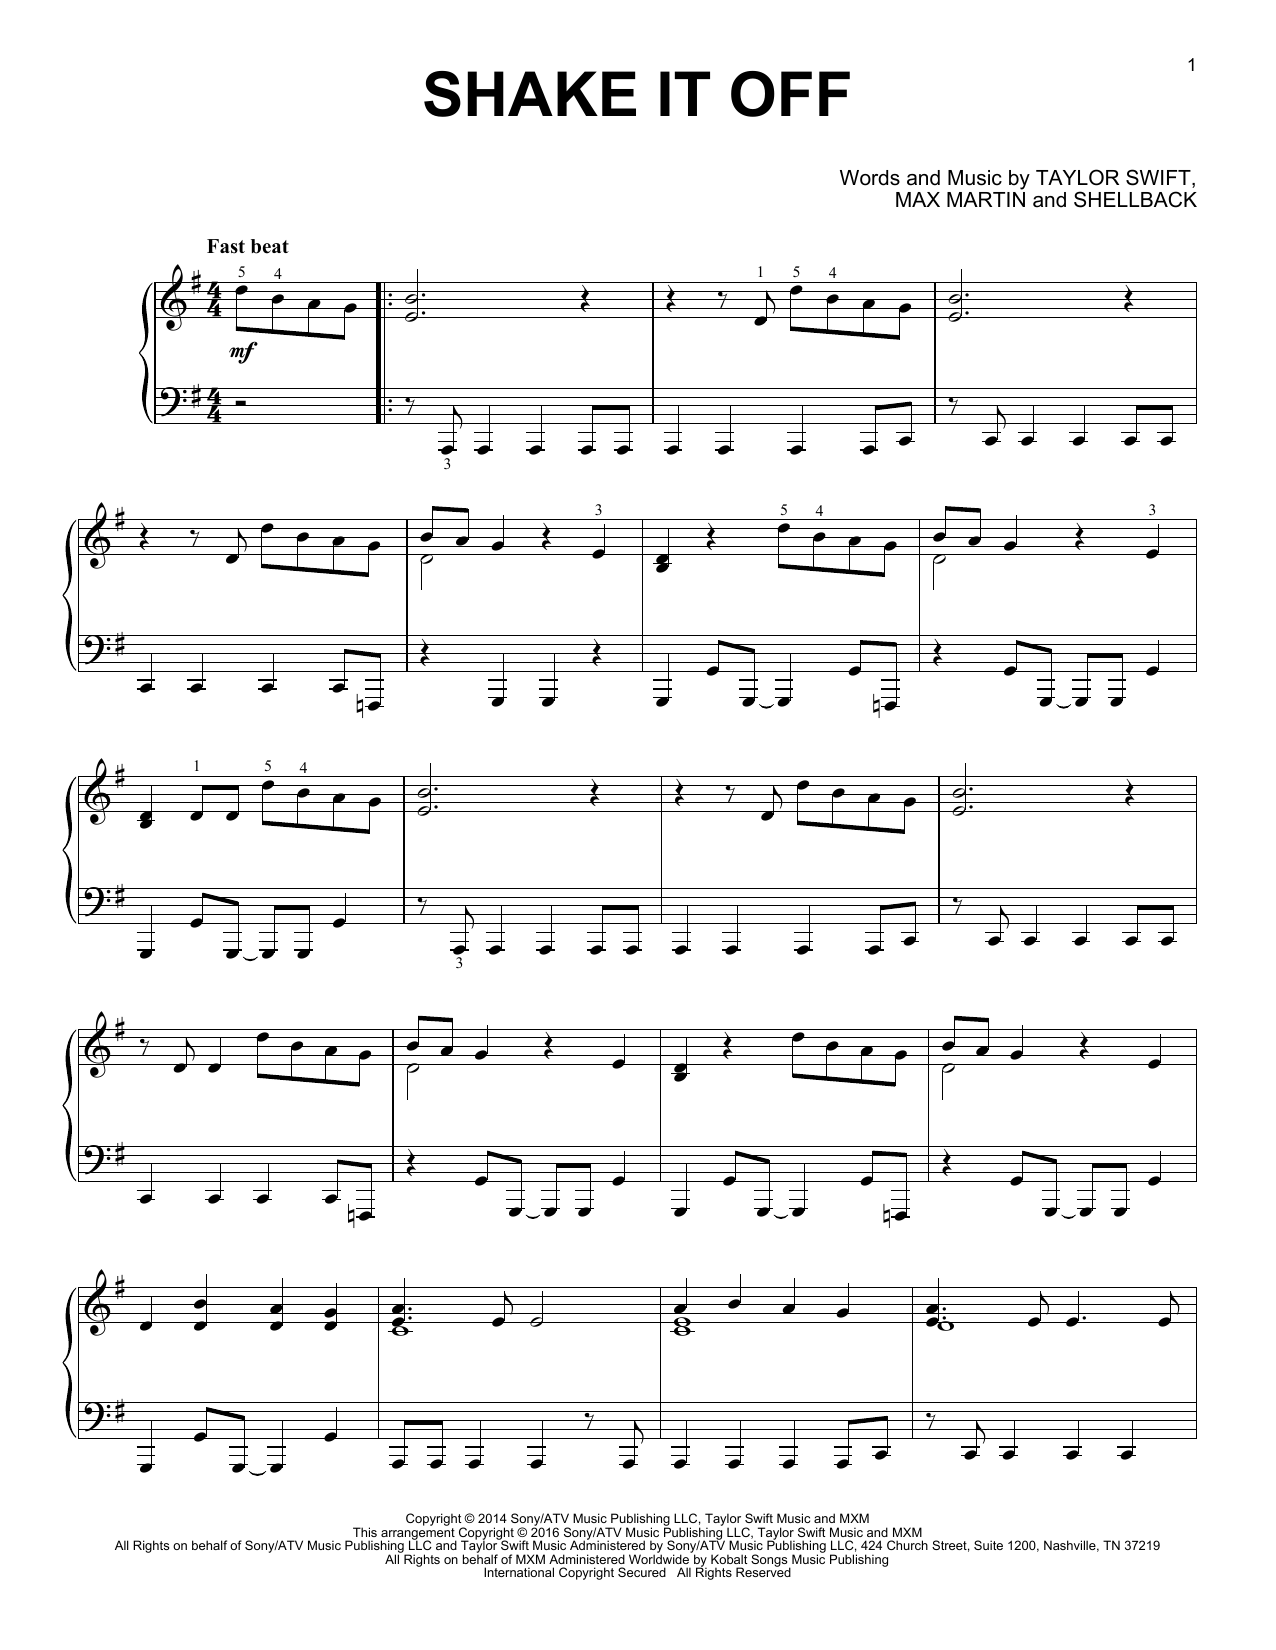 Taylor Swift Shake It Off 174915 Sheet music notes